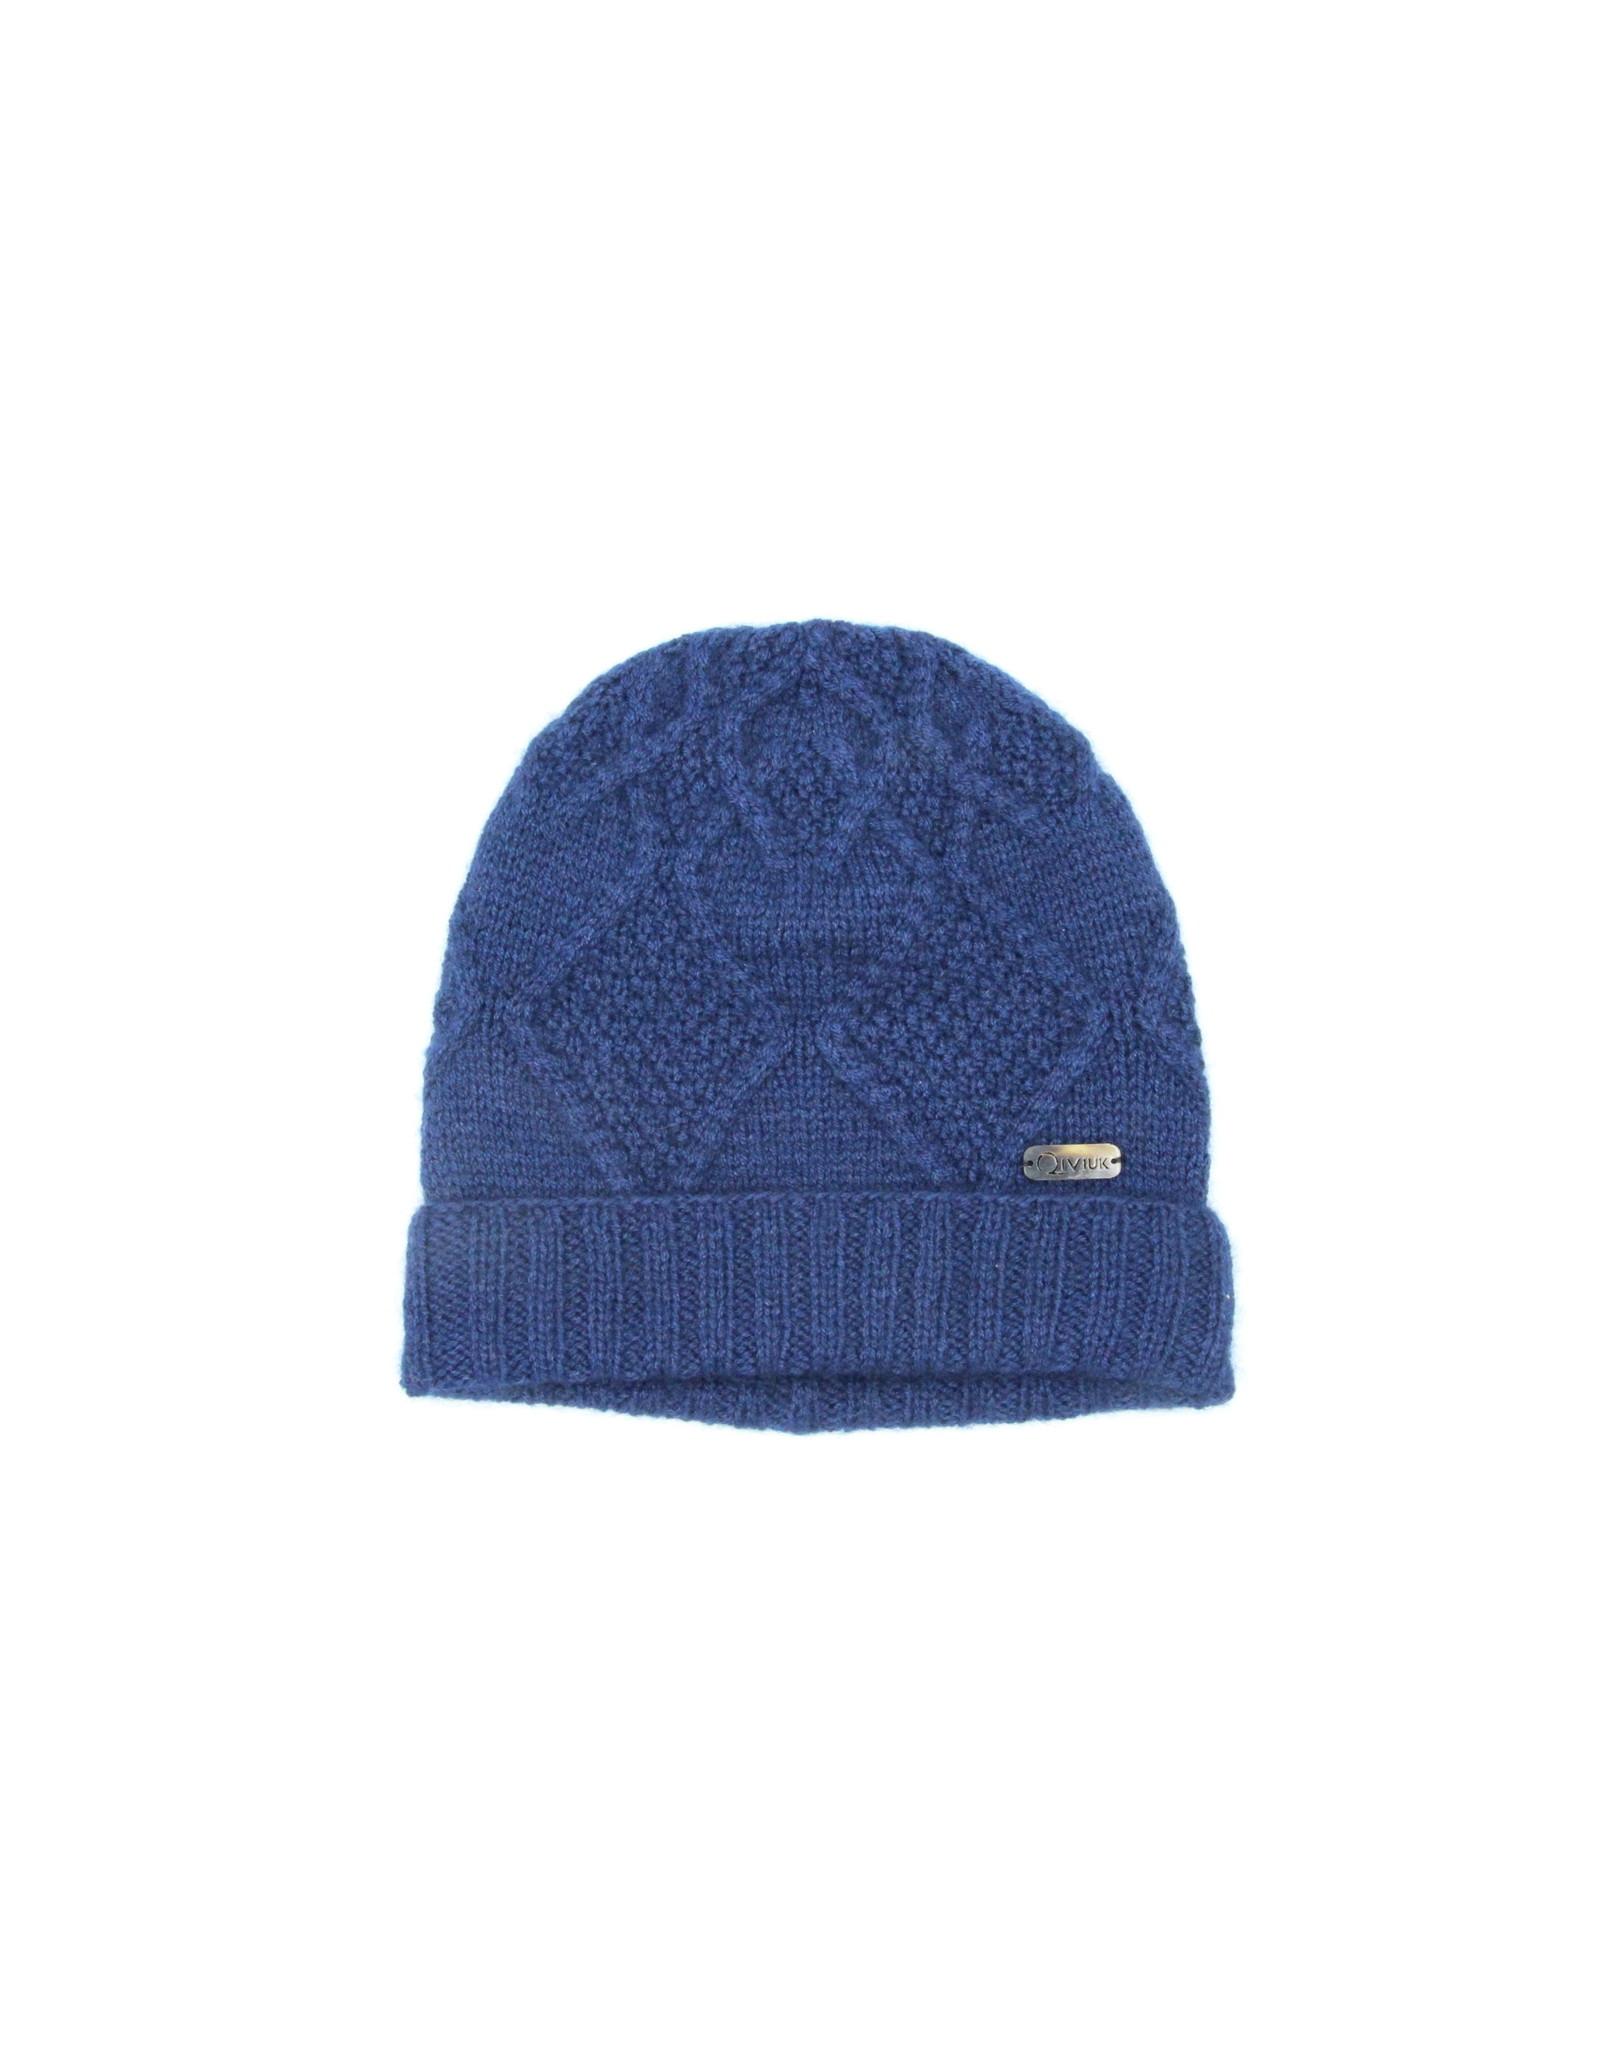 Mena Hat - 45% Qiviuk 45% Merino 10% Silk